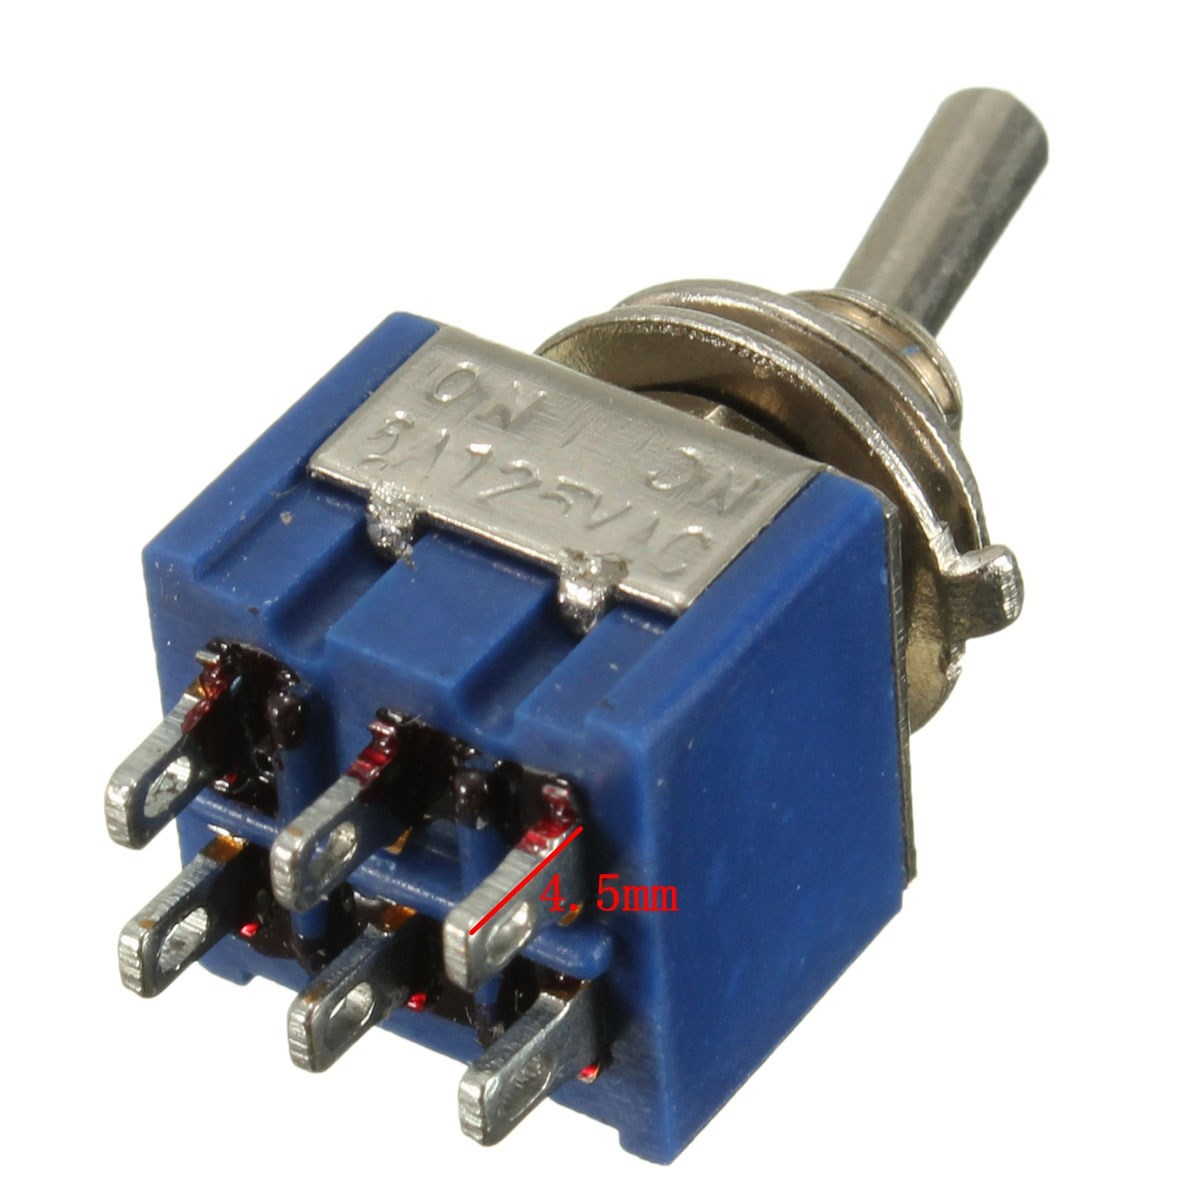 halogen 125v toggle switch wiring diagram halogen diy wiring double pole 3 way switch nilza net